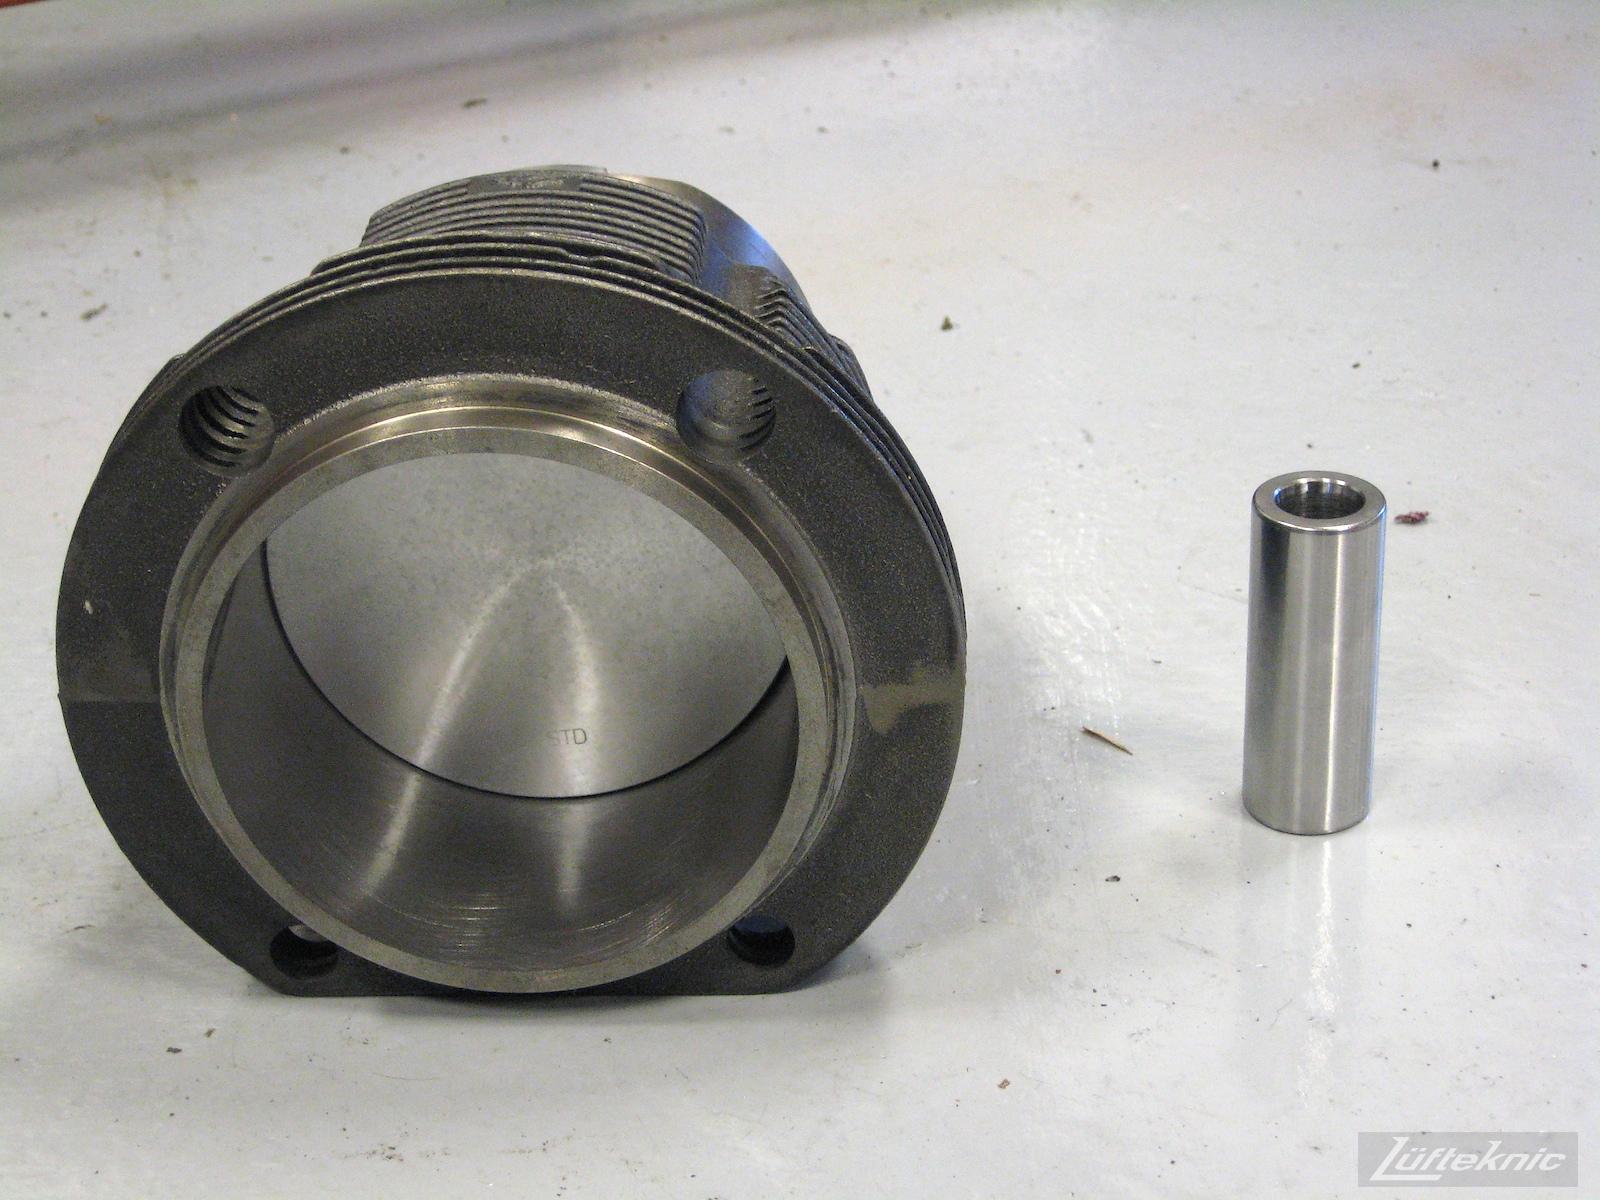 Porsche 914 piston, cylinder and wrist pin prior to install.